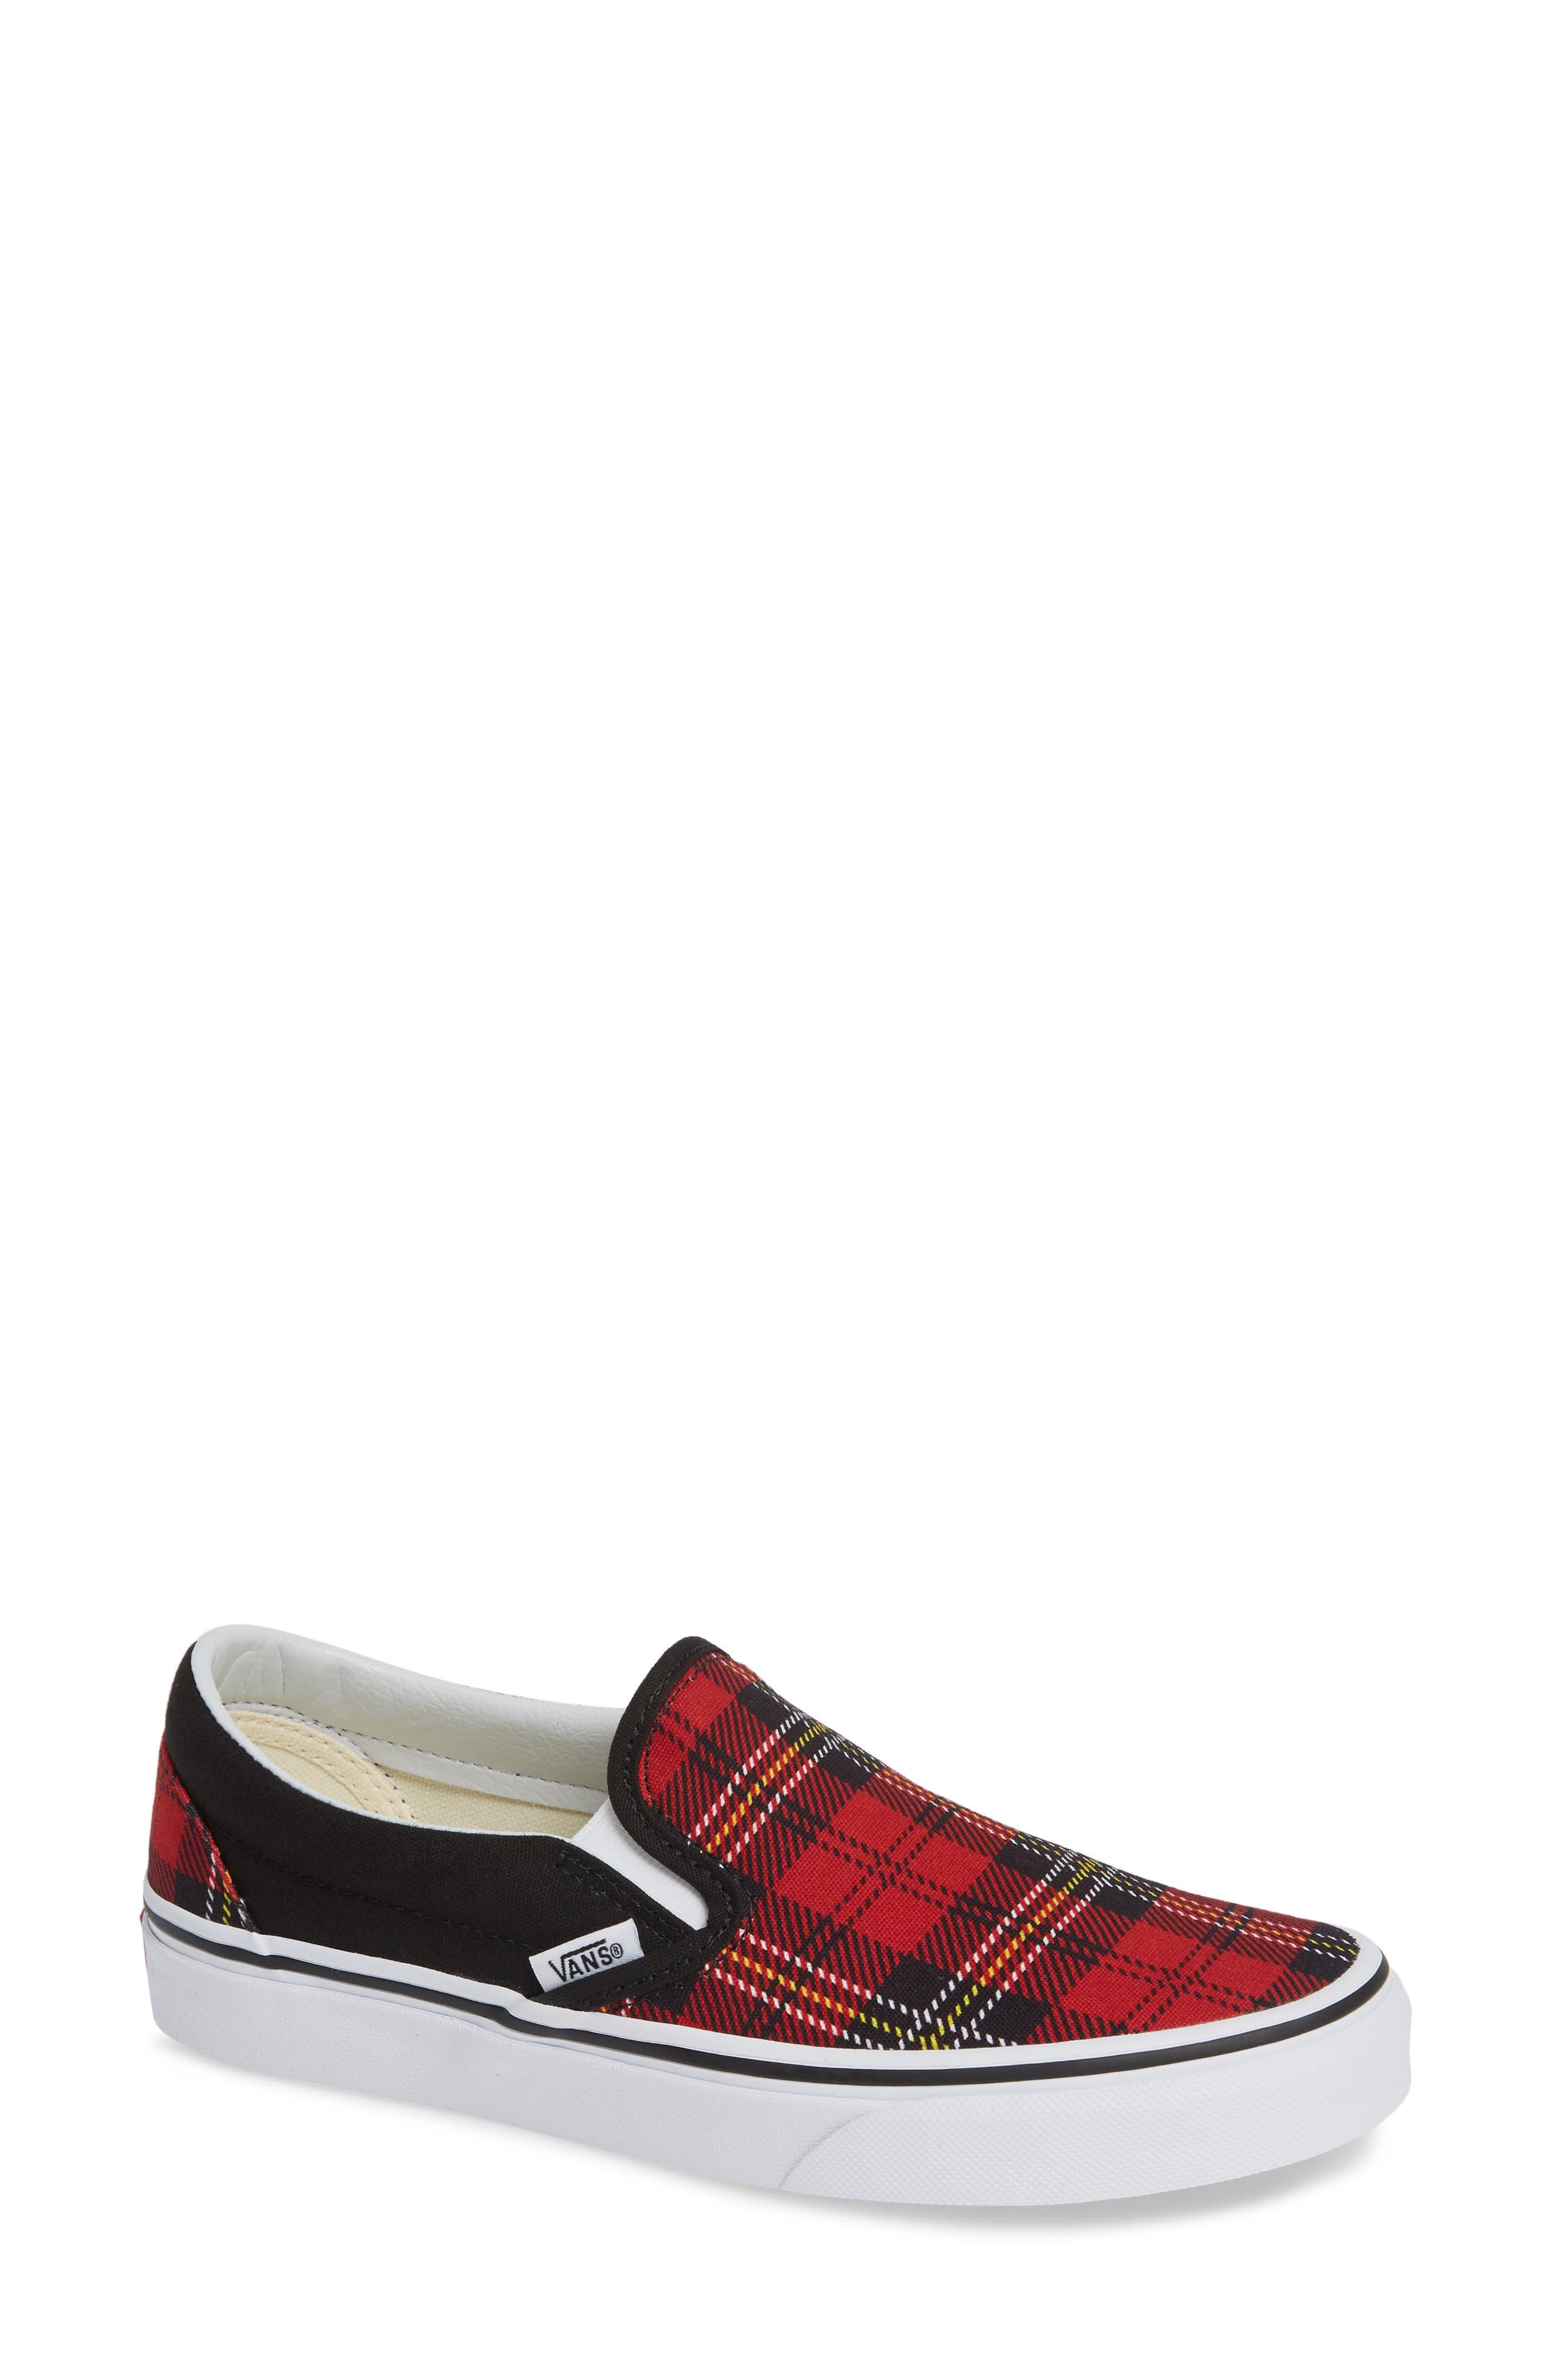 ,                             Classic Slip-On Sneaker,                             Main thumbnail 47, color,                             602